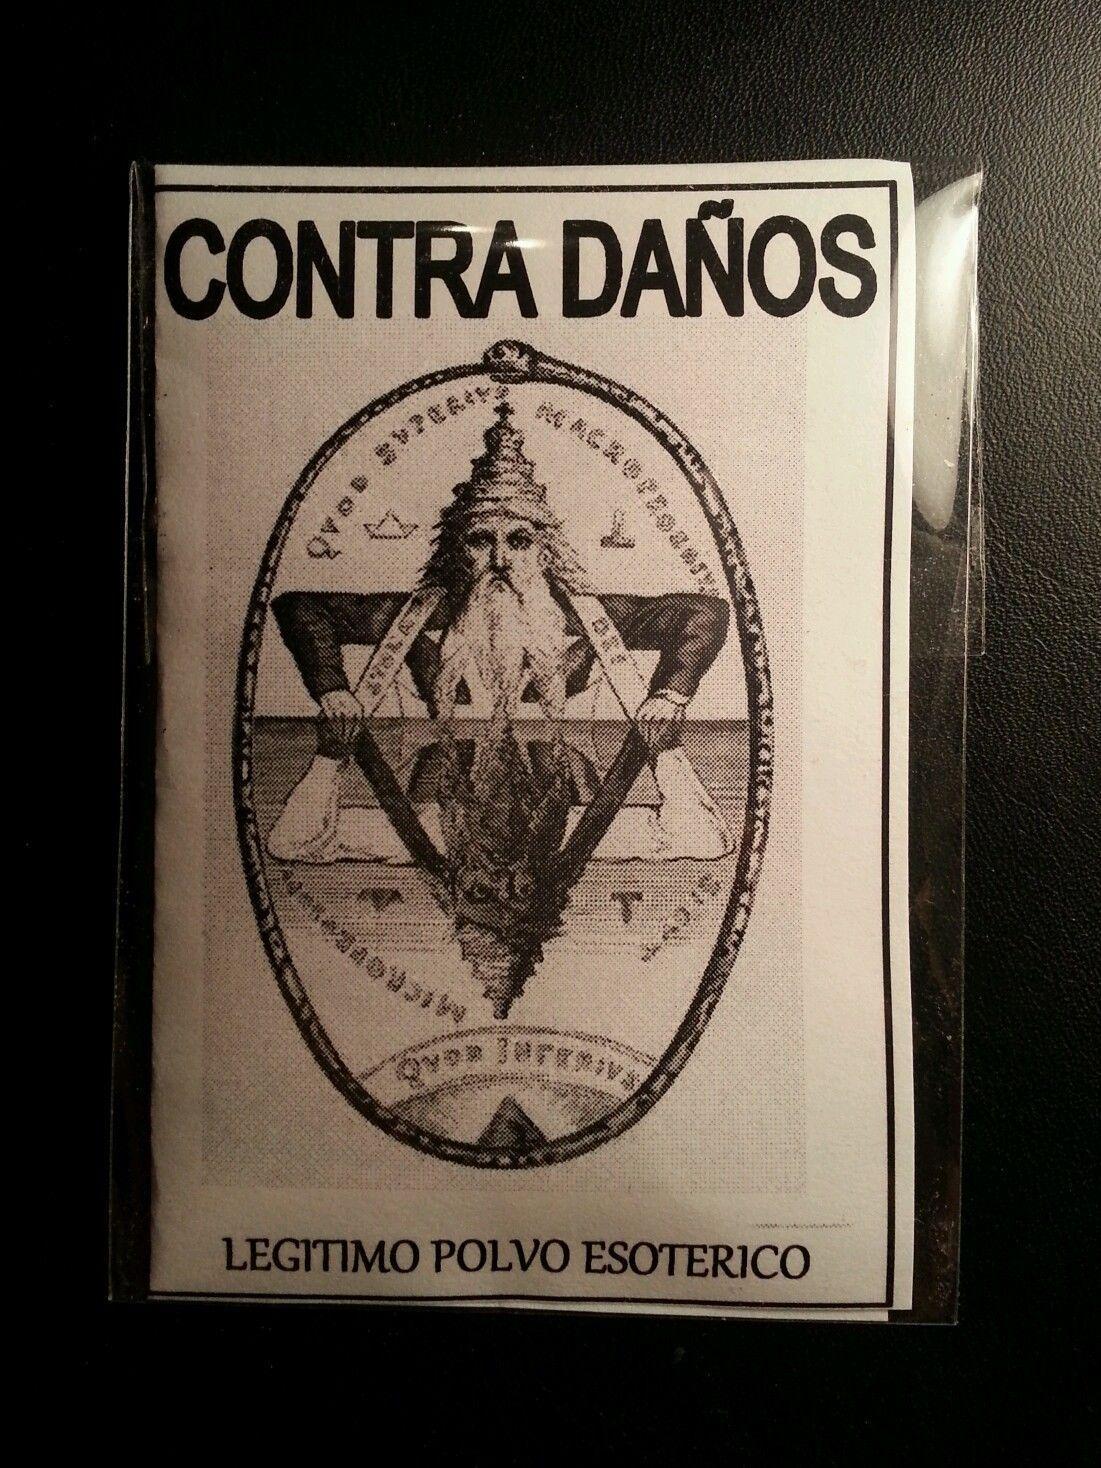 LEGITIMO POLVO ESOTERICO  CONTRA DAÑOS